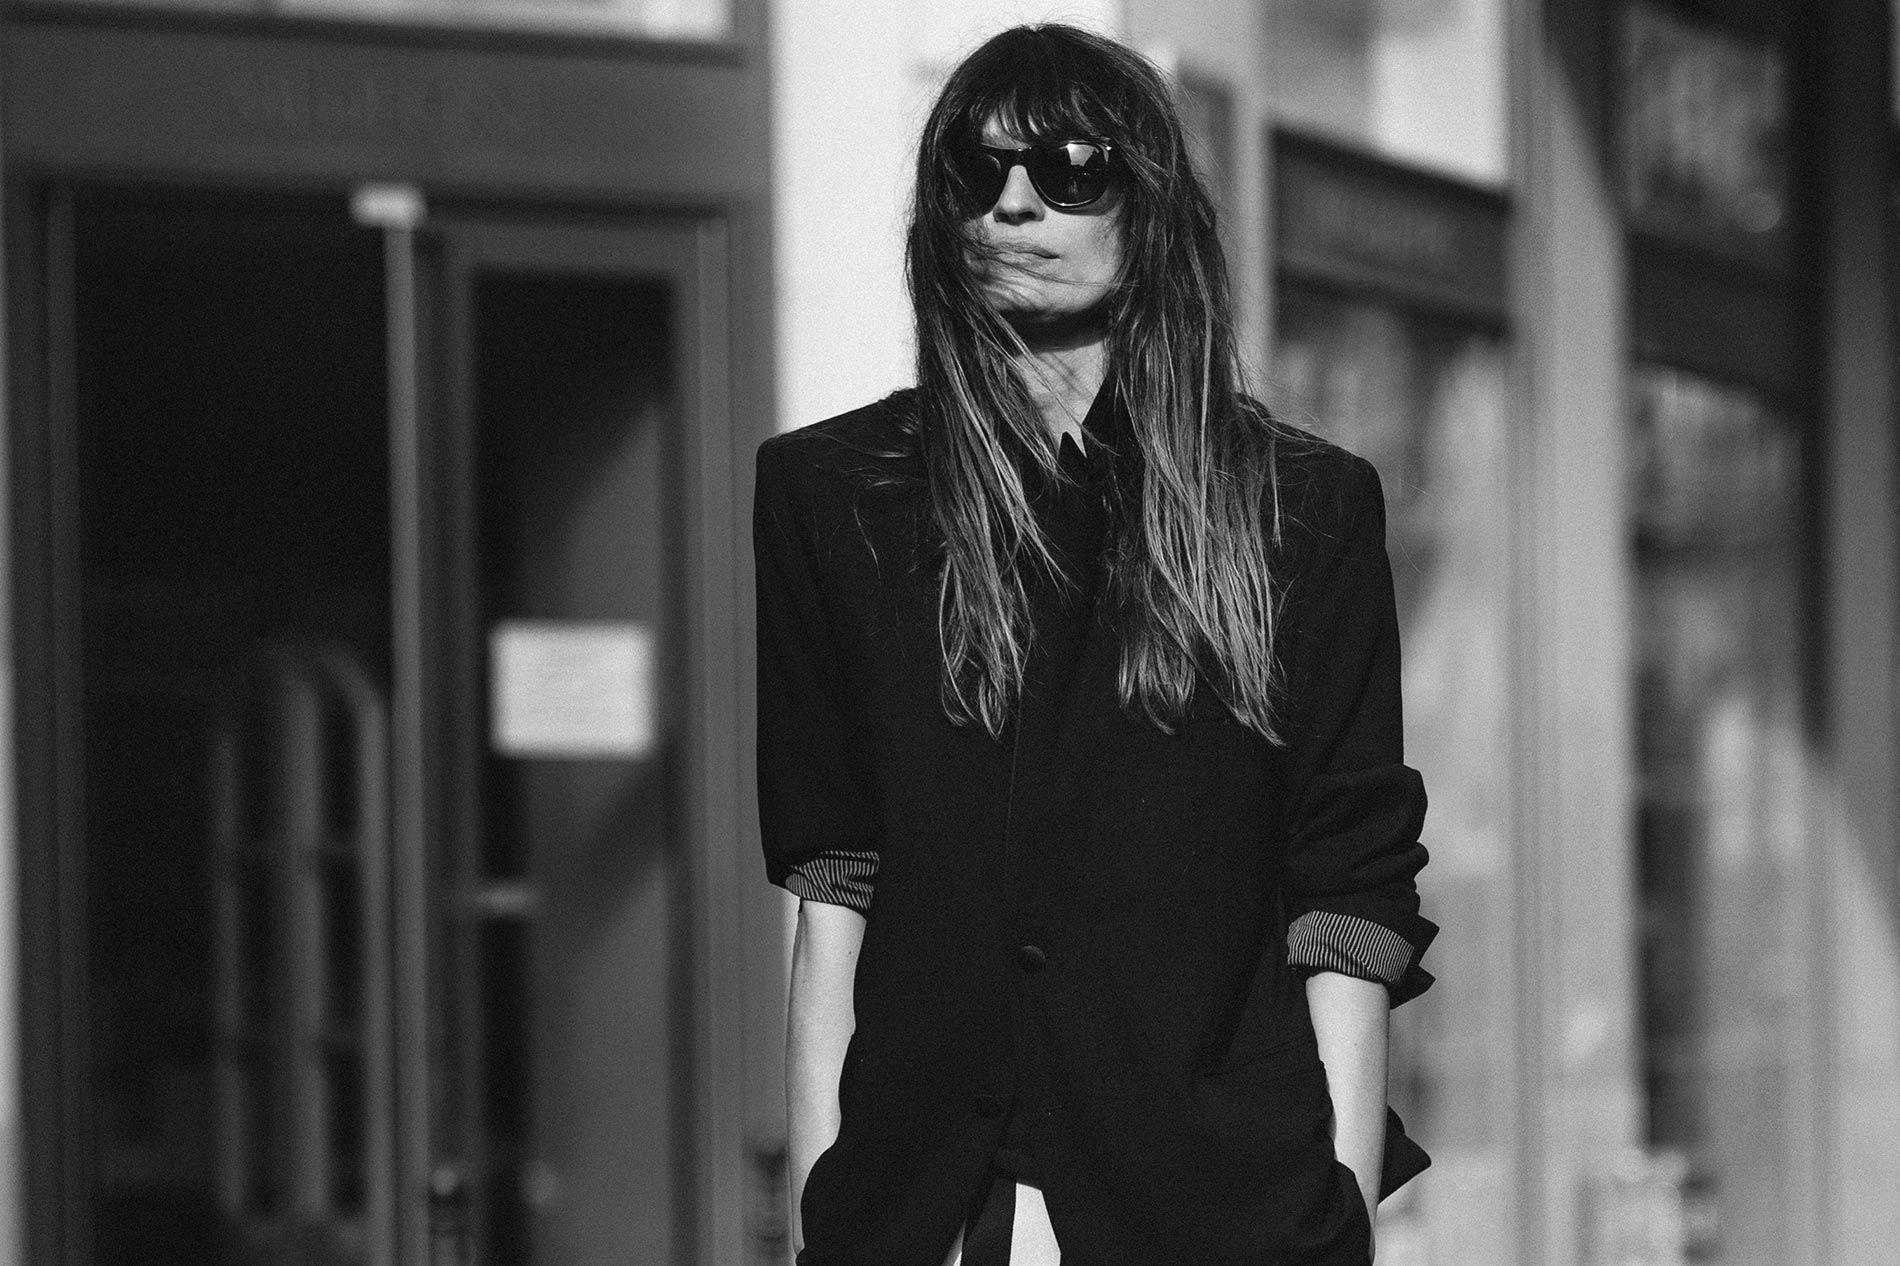 Citizen Couture / CAROLINE DE MAIGRET  // #Fashion, #FashionBlog, #FashionBlogger, #Ootd, #OutfitOfTheDay, #StreetStyle, #Style